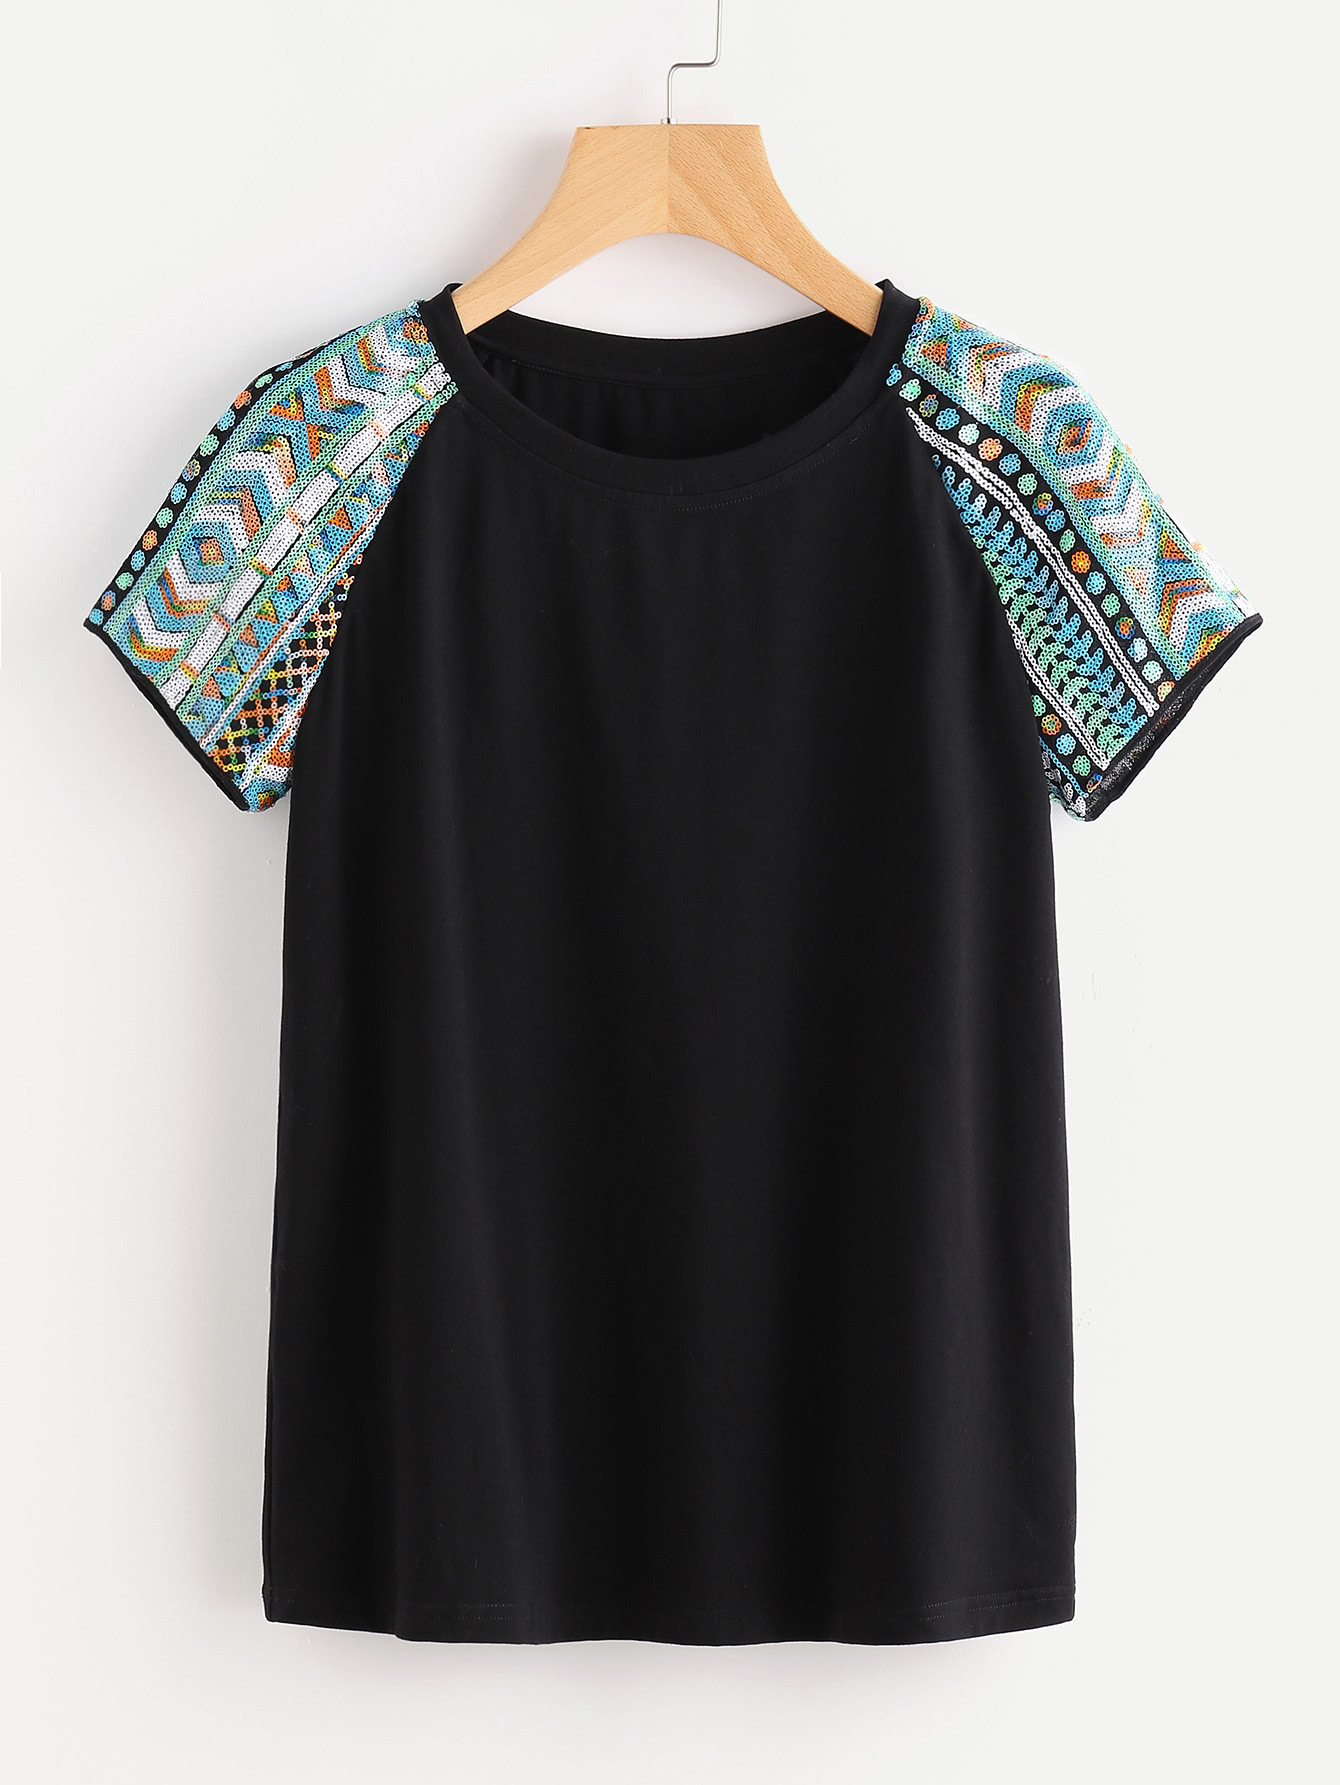 Фото Geo Sequin Embroidered Raglan Sleeve Tee. Купить с доставкой